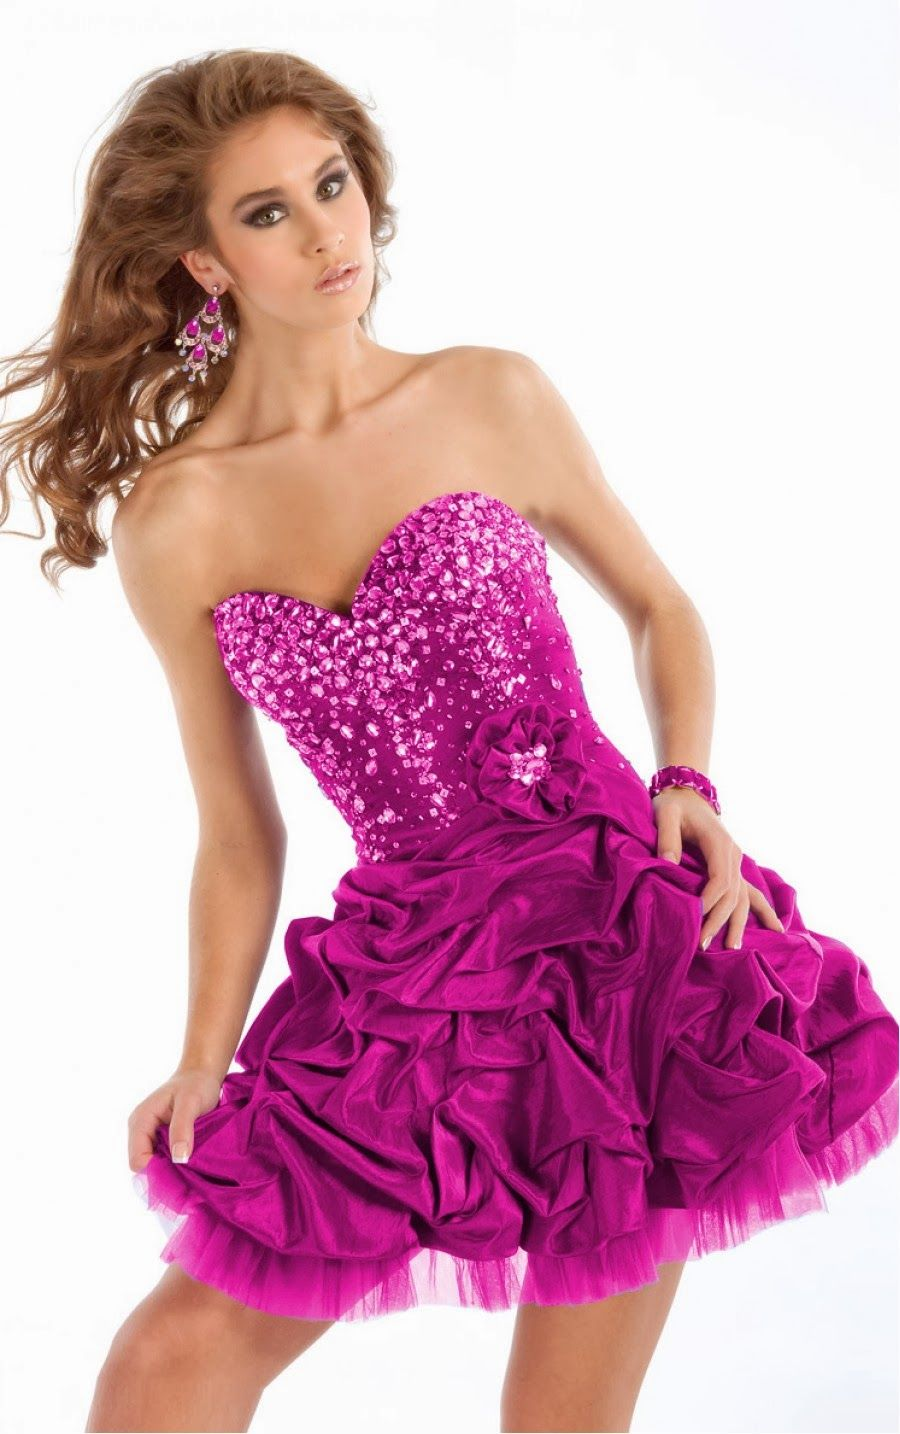 Hermosos vestidos de fiesta 2014 | Moda | Pinterest | Hermosa ...